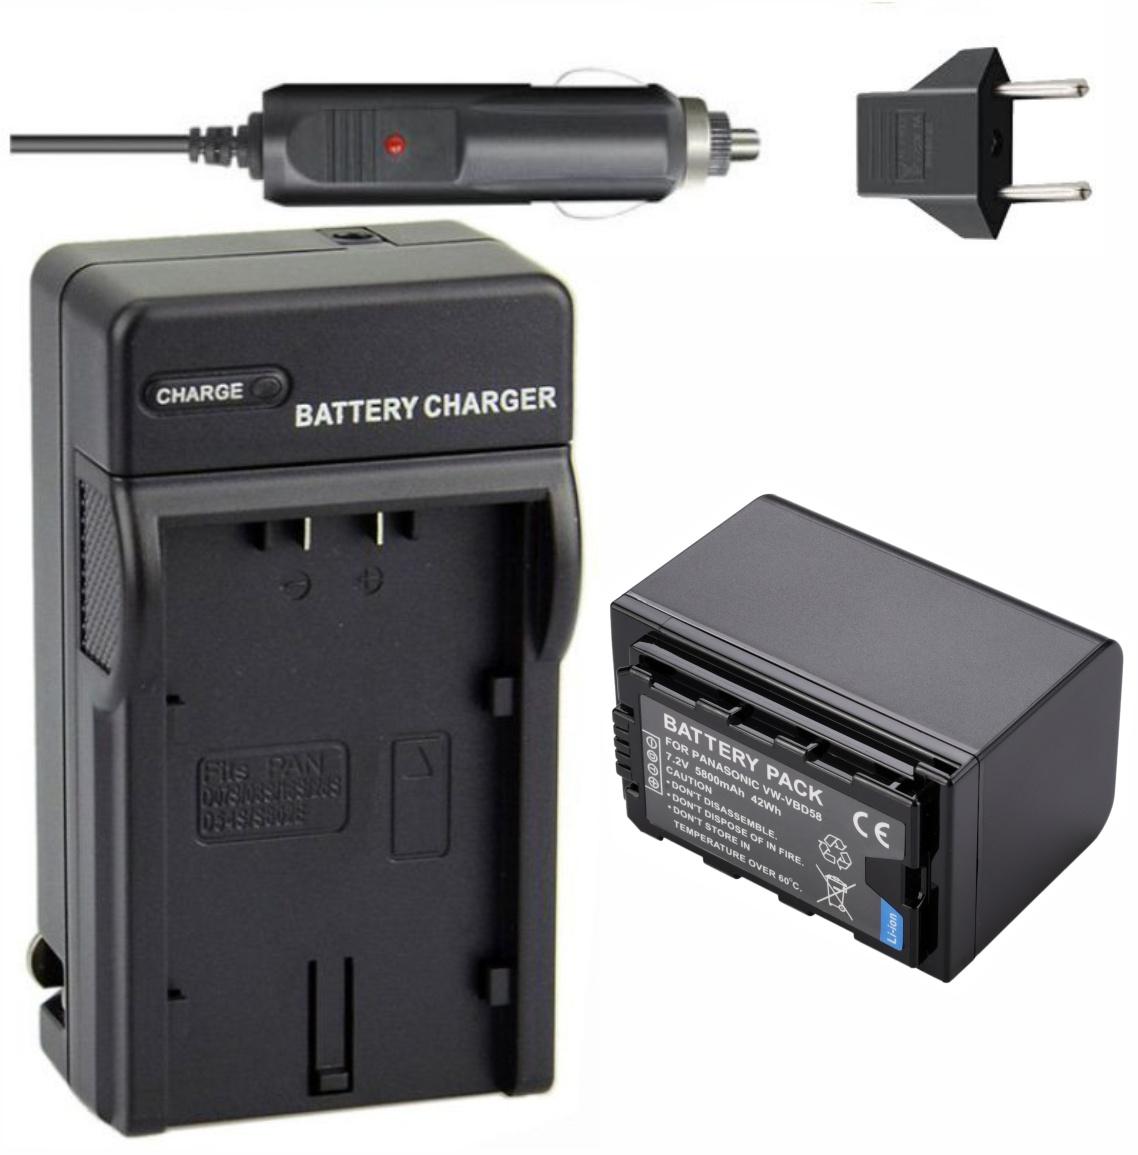 Vw-vbd58 + Carregador Para Panasonic AG-AC8 AJ-PX270 HC-X1000